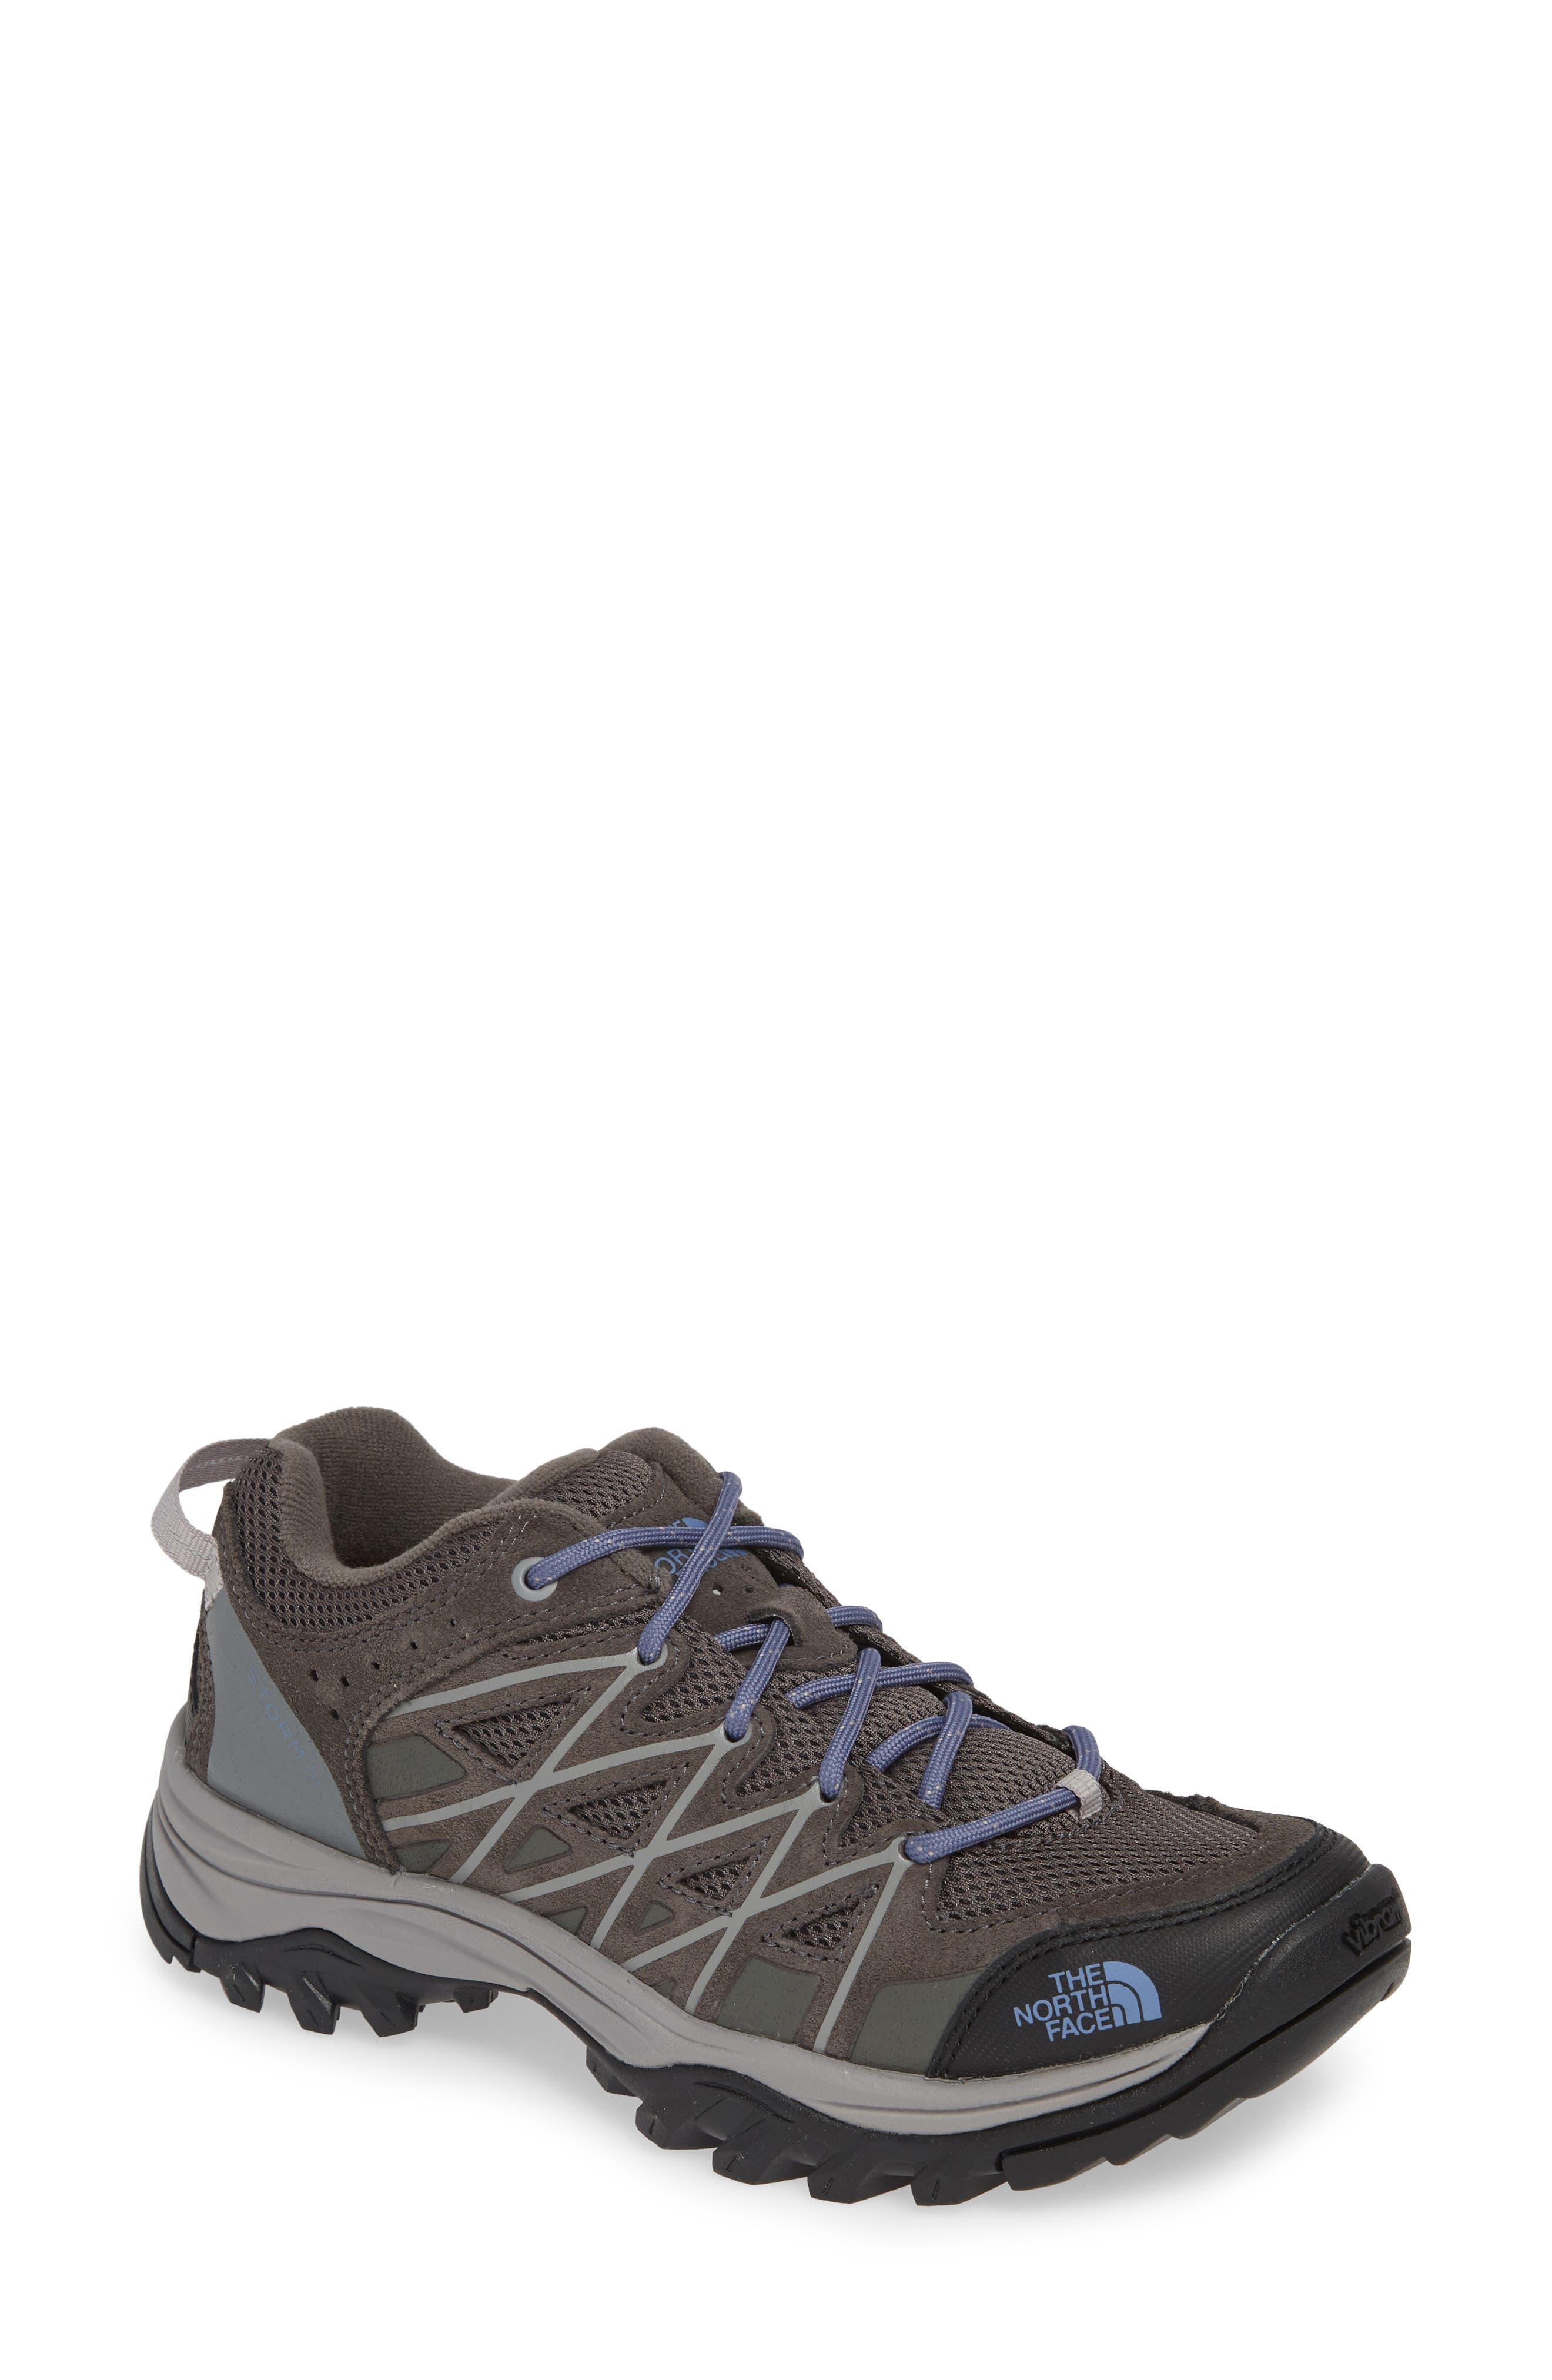 05cec1e82 Women's The North Face Shoes   Nordstrom